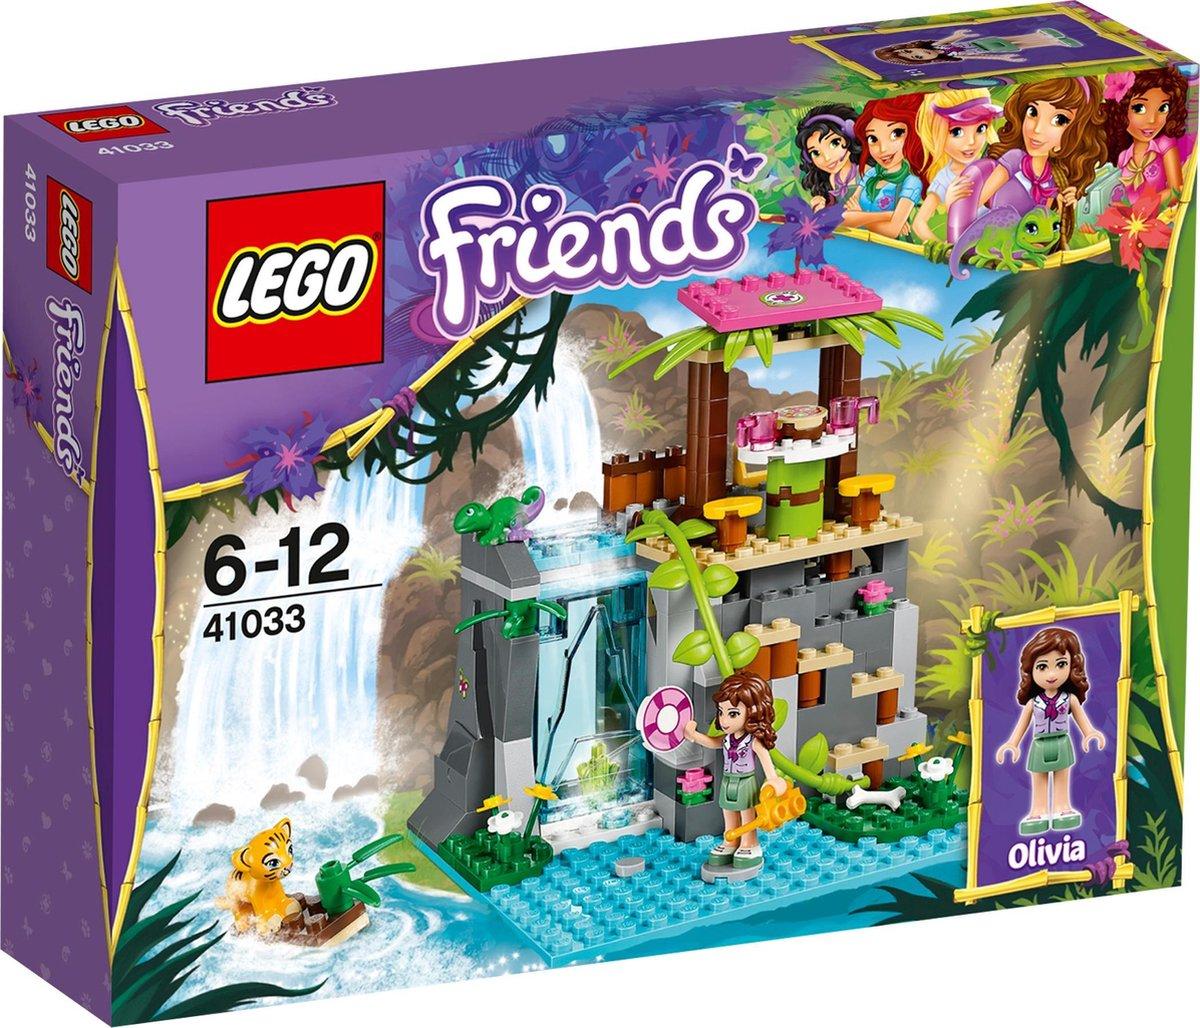 LEGO Friends Junglewaterval Reddingsactie - 41033